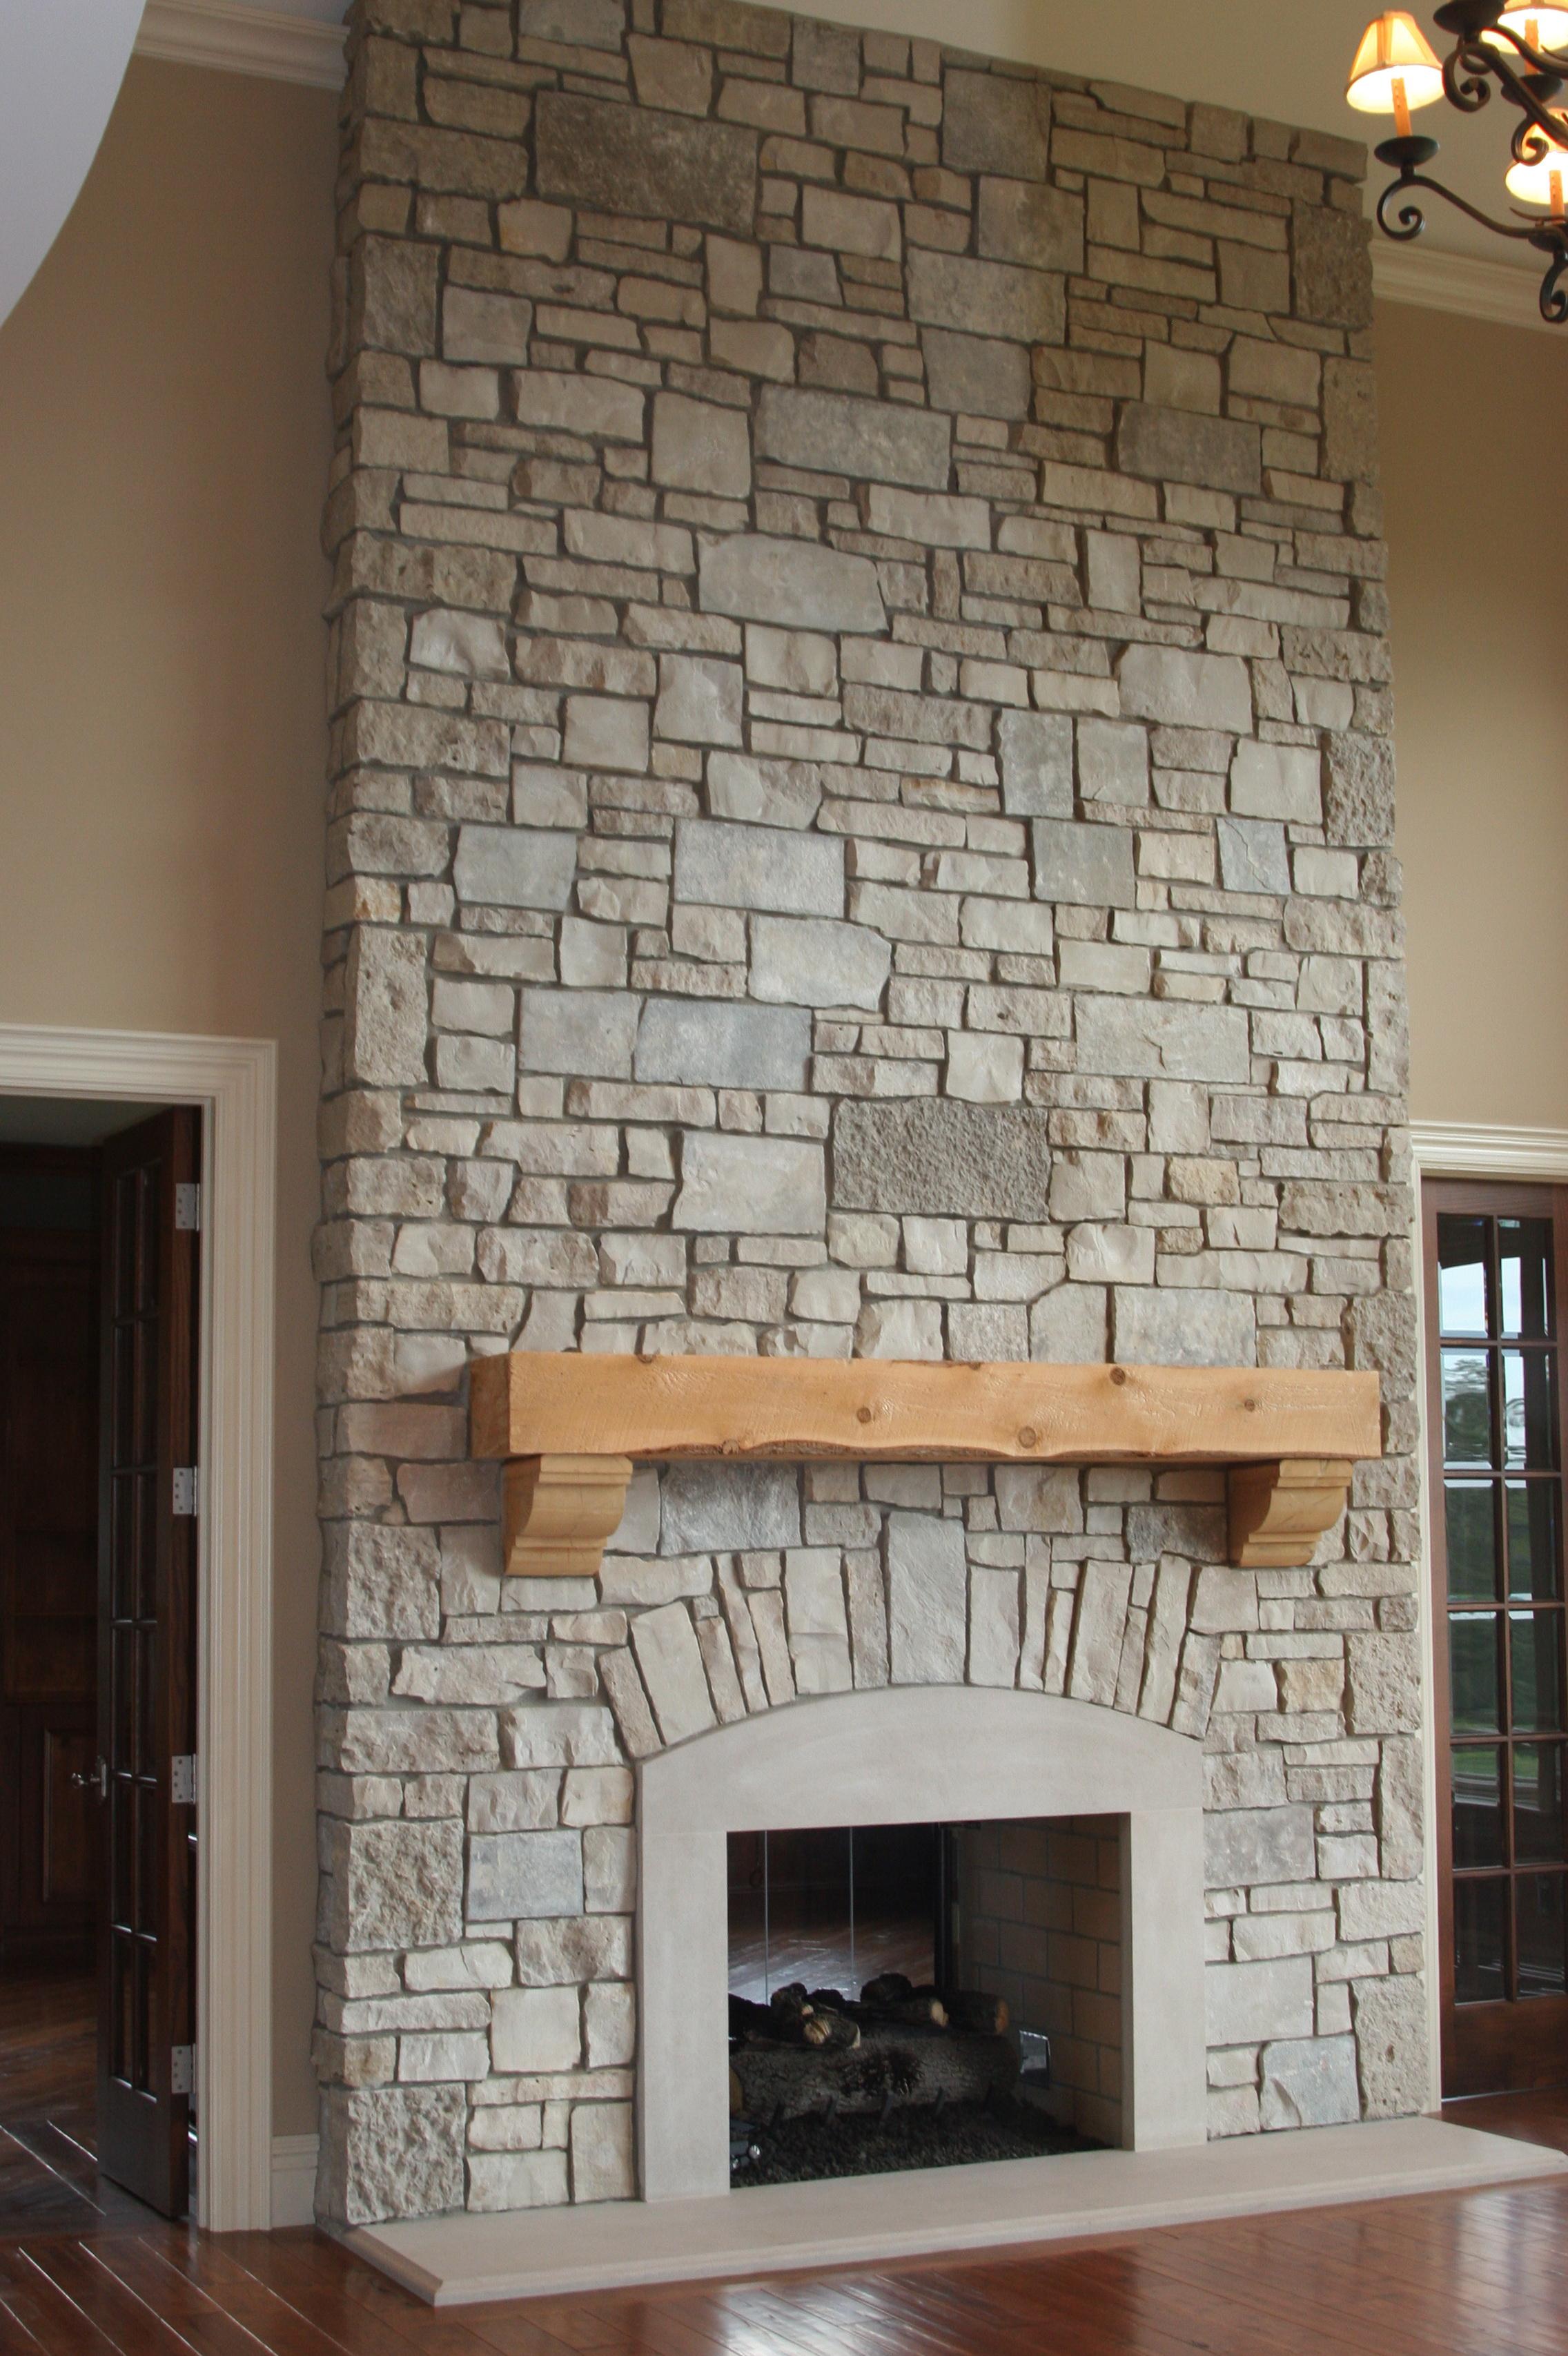 Fireplace Wall Tile Design Ideas Home Design Ideas